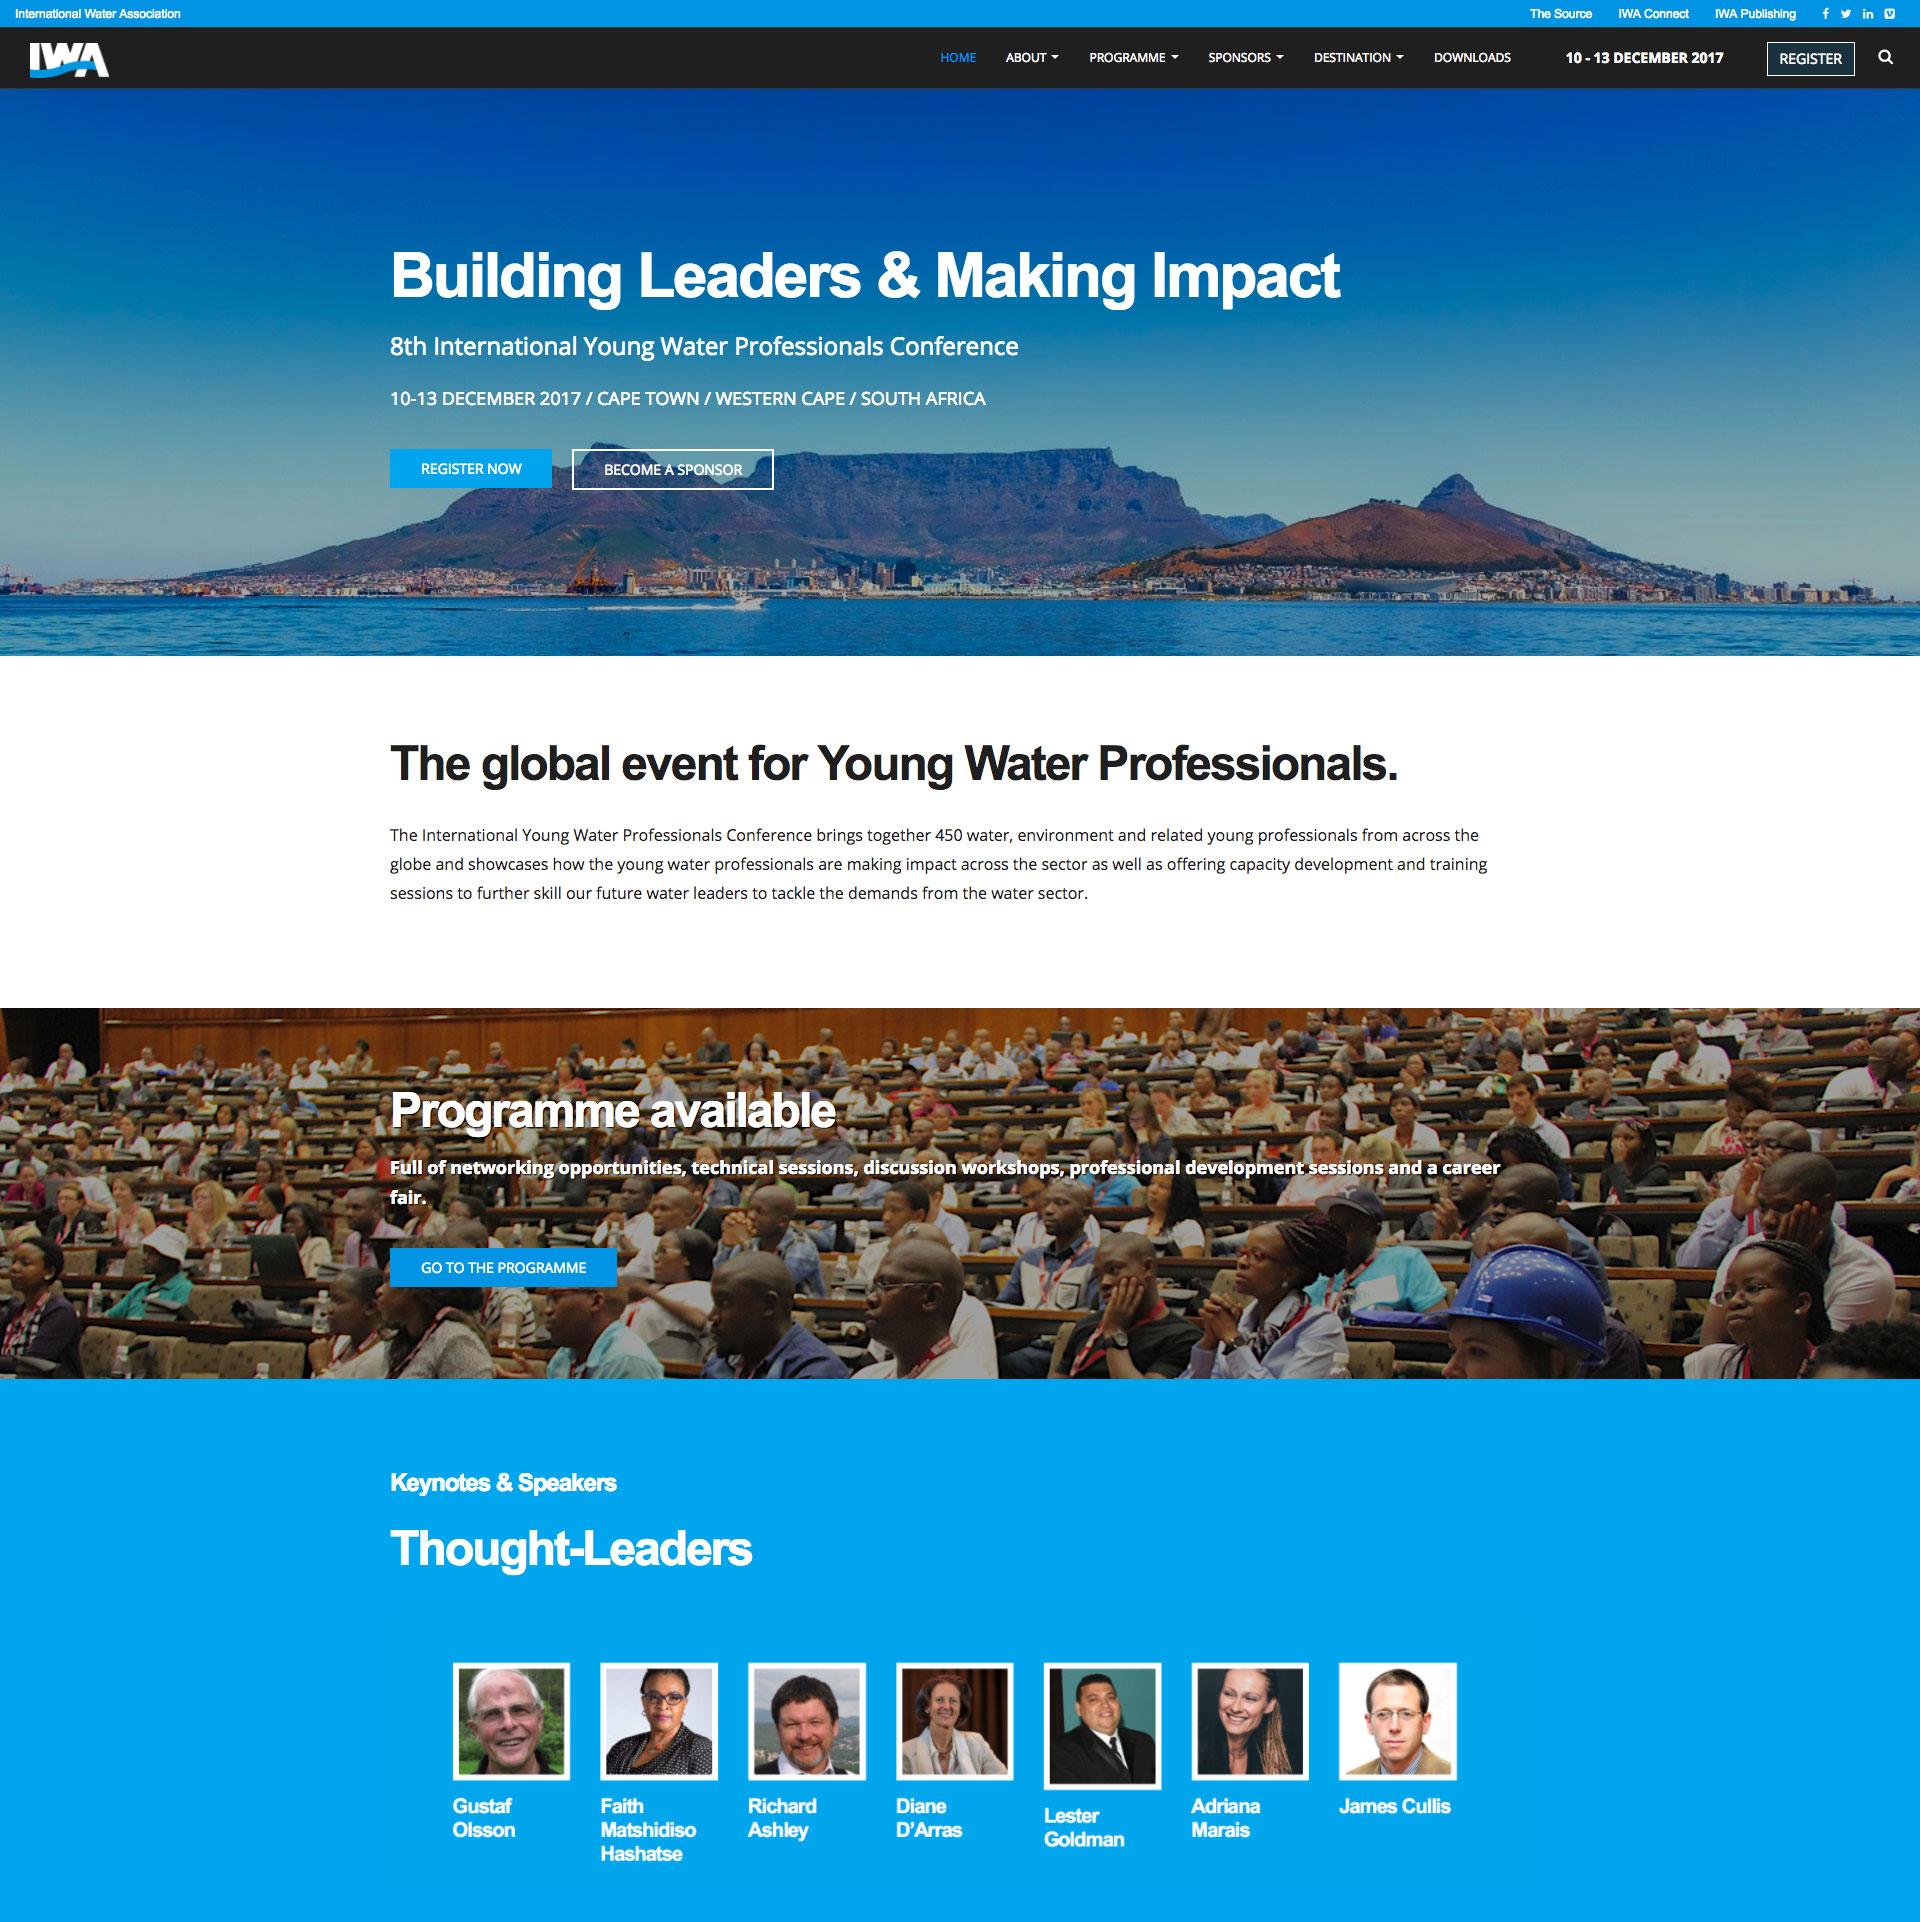 iwaywpconference.org